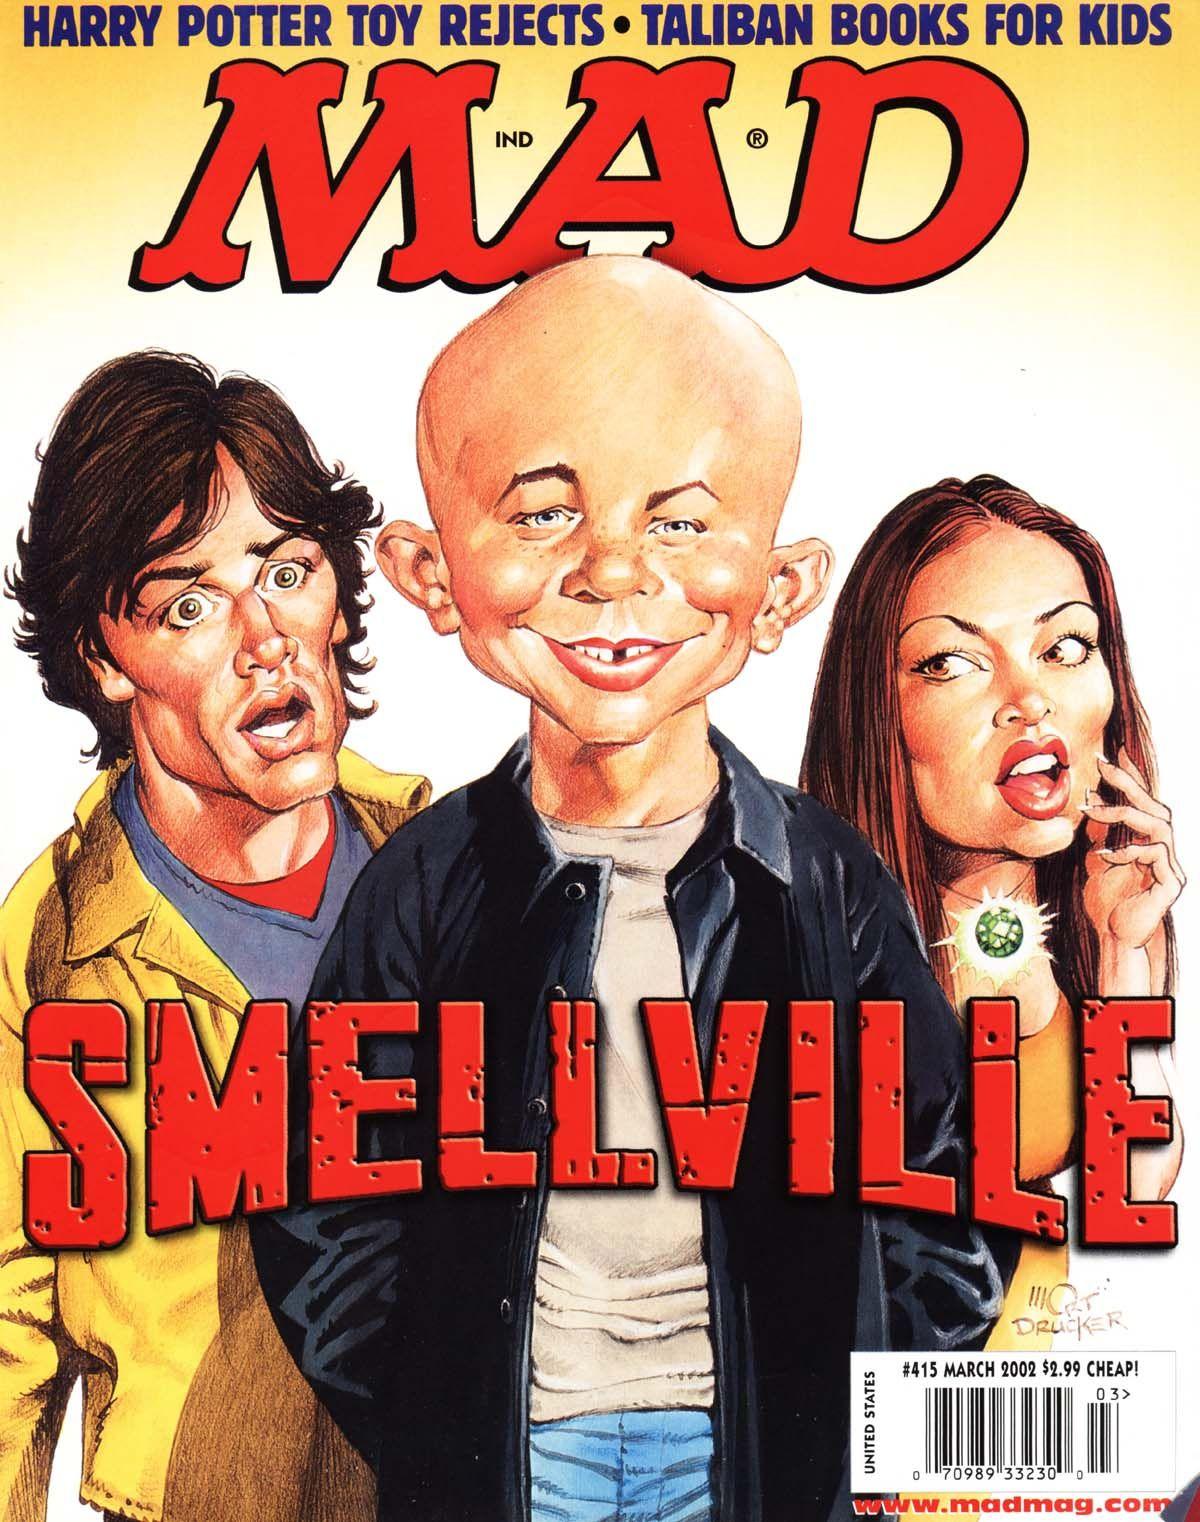 smallville superman spoof mad magazine